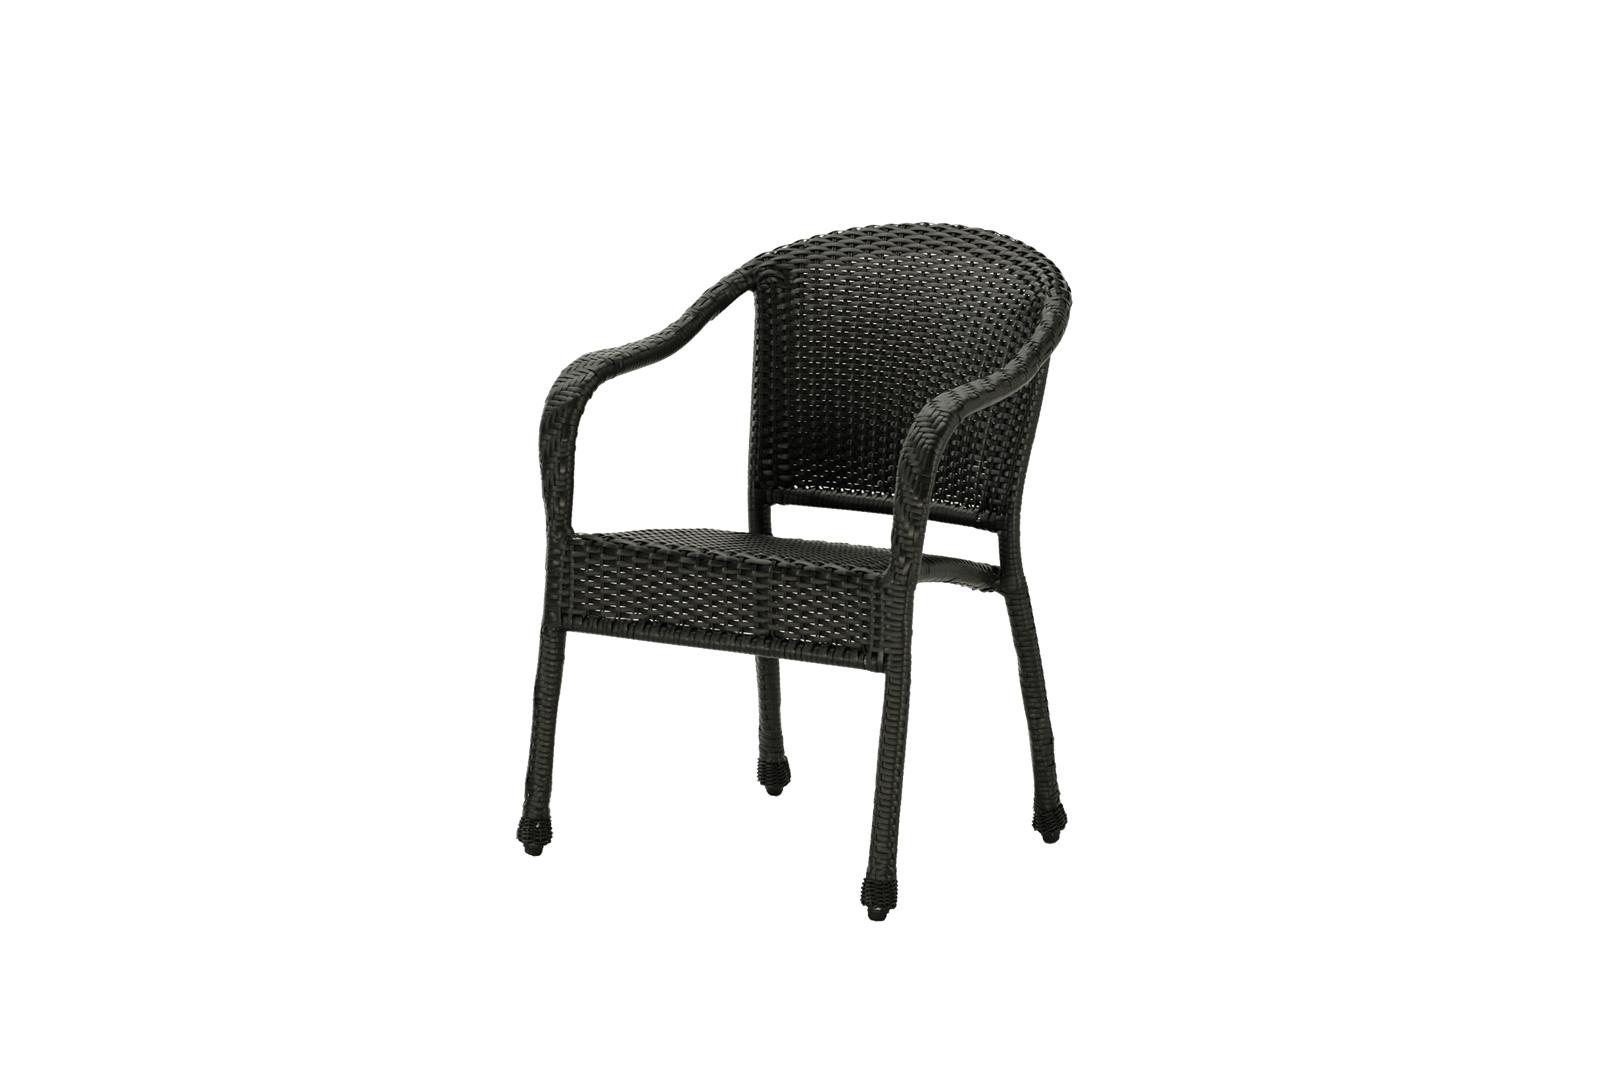 Outdoor Sun valley dining chair in dark wicker.